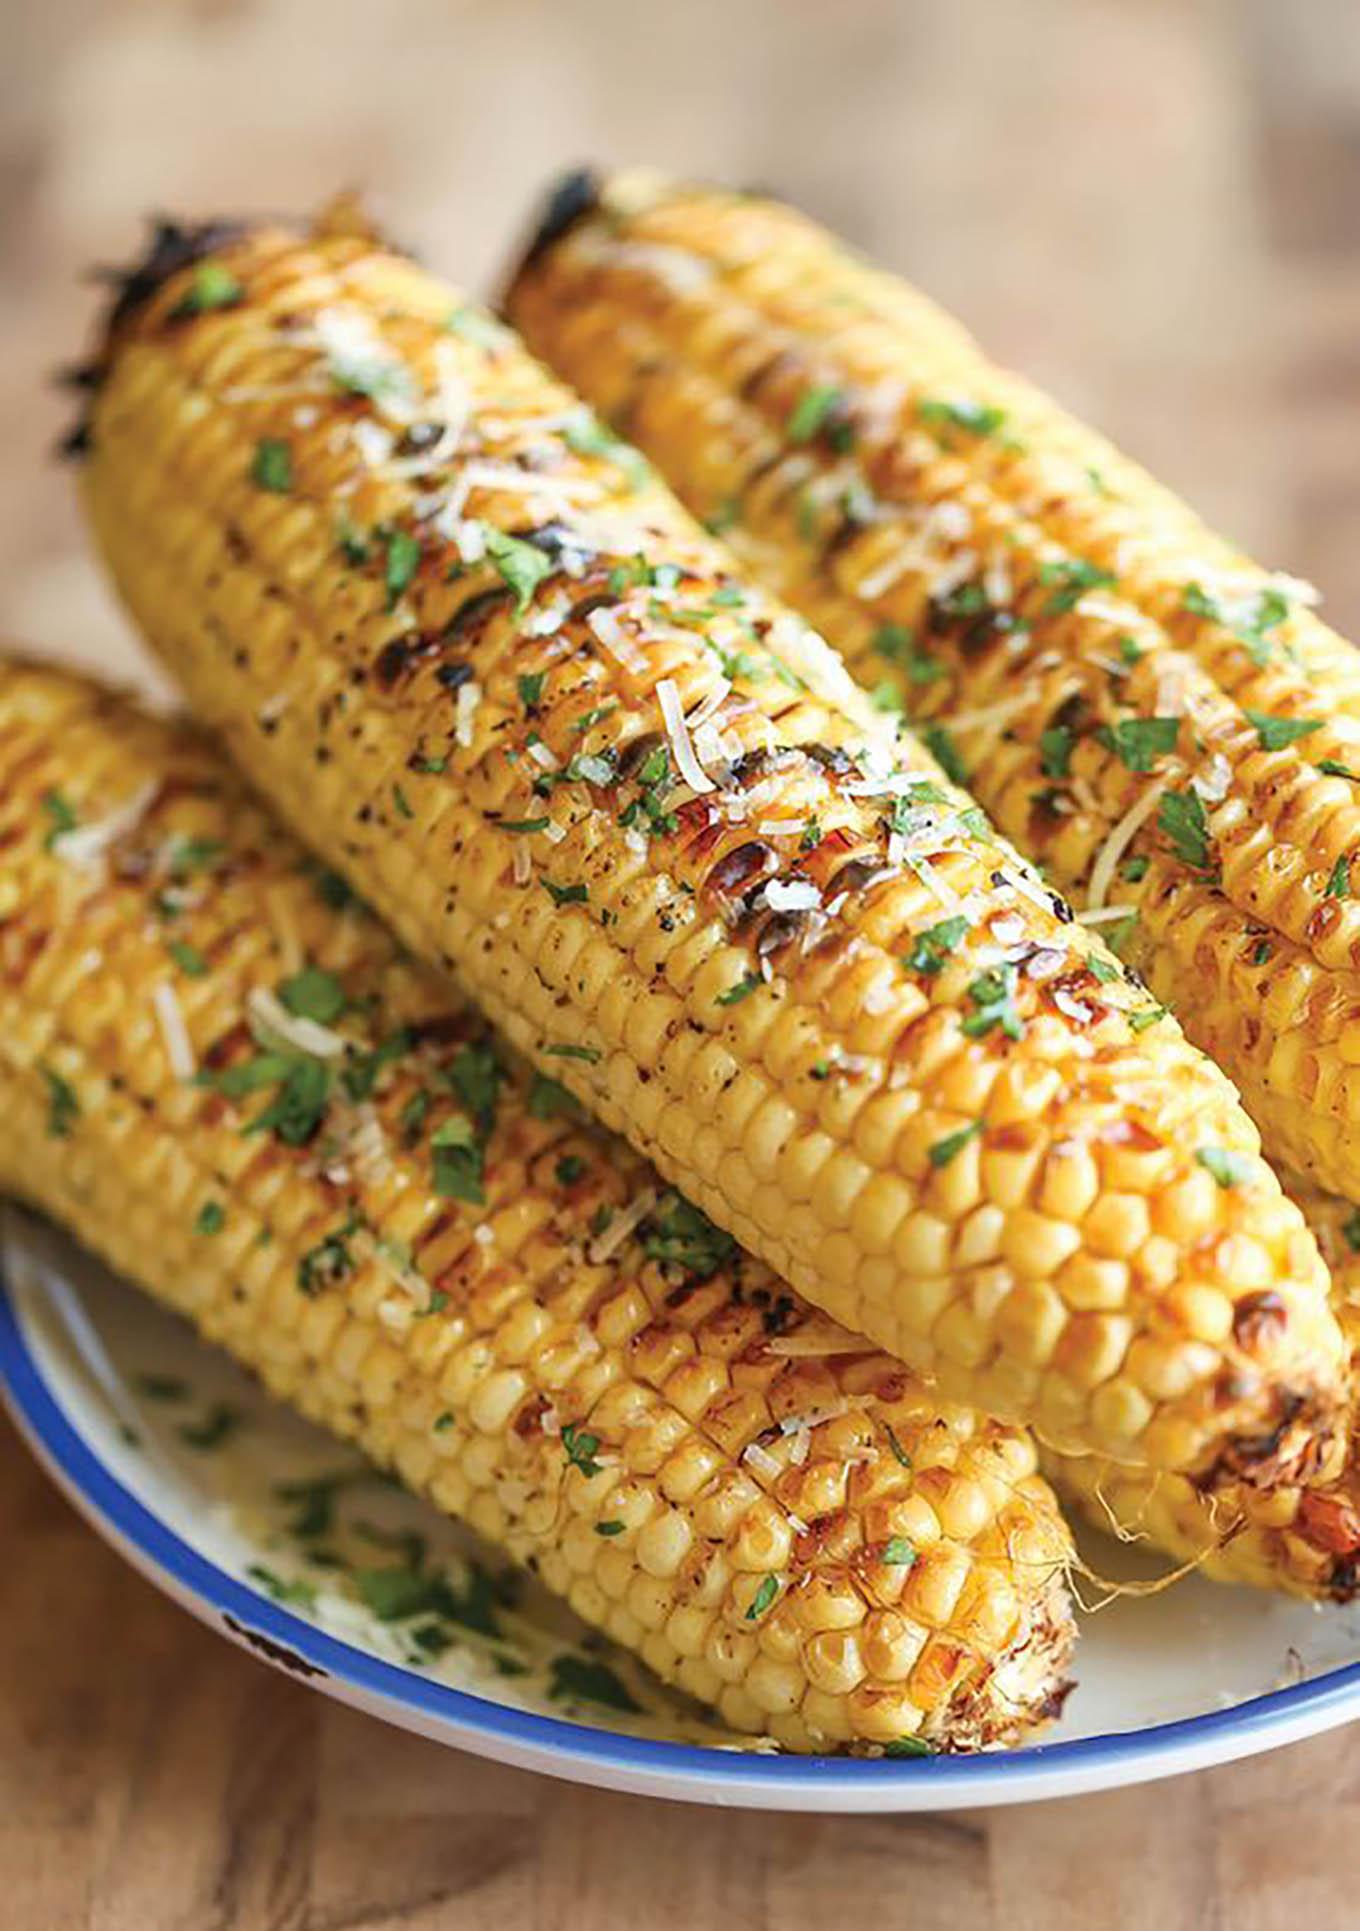 parmesean corn on the cob